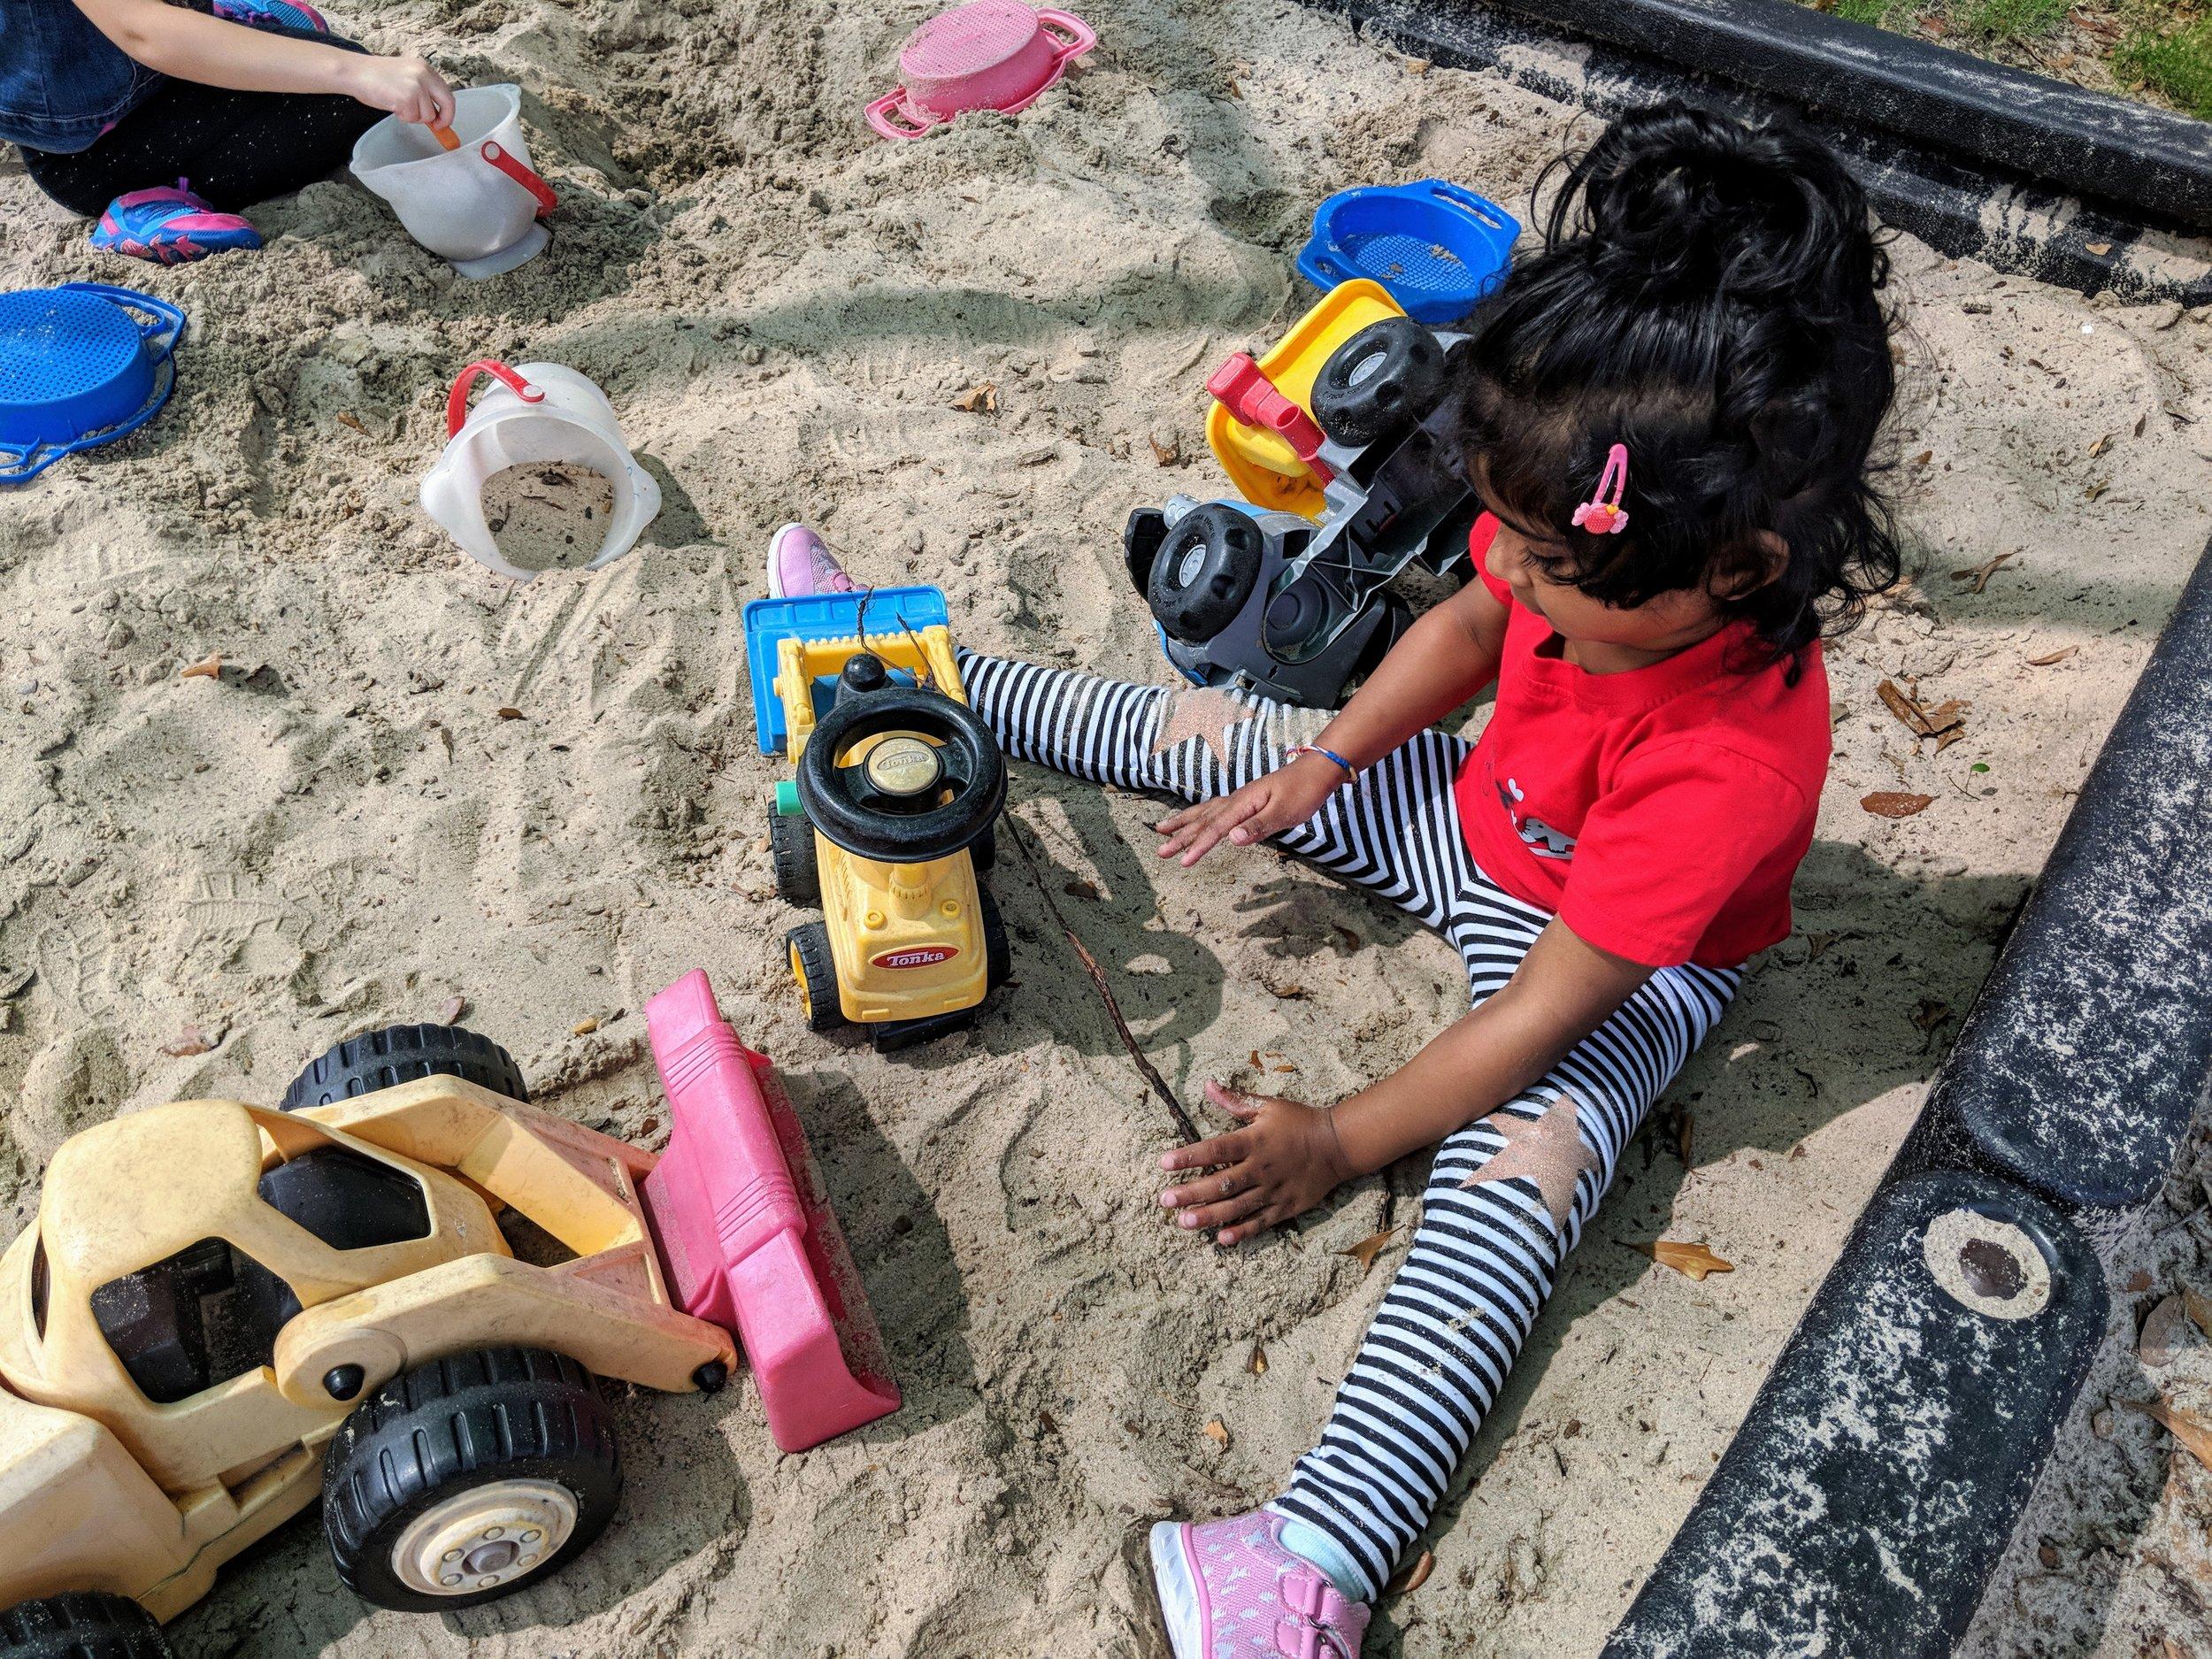 Sandbox on Preschool playground